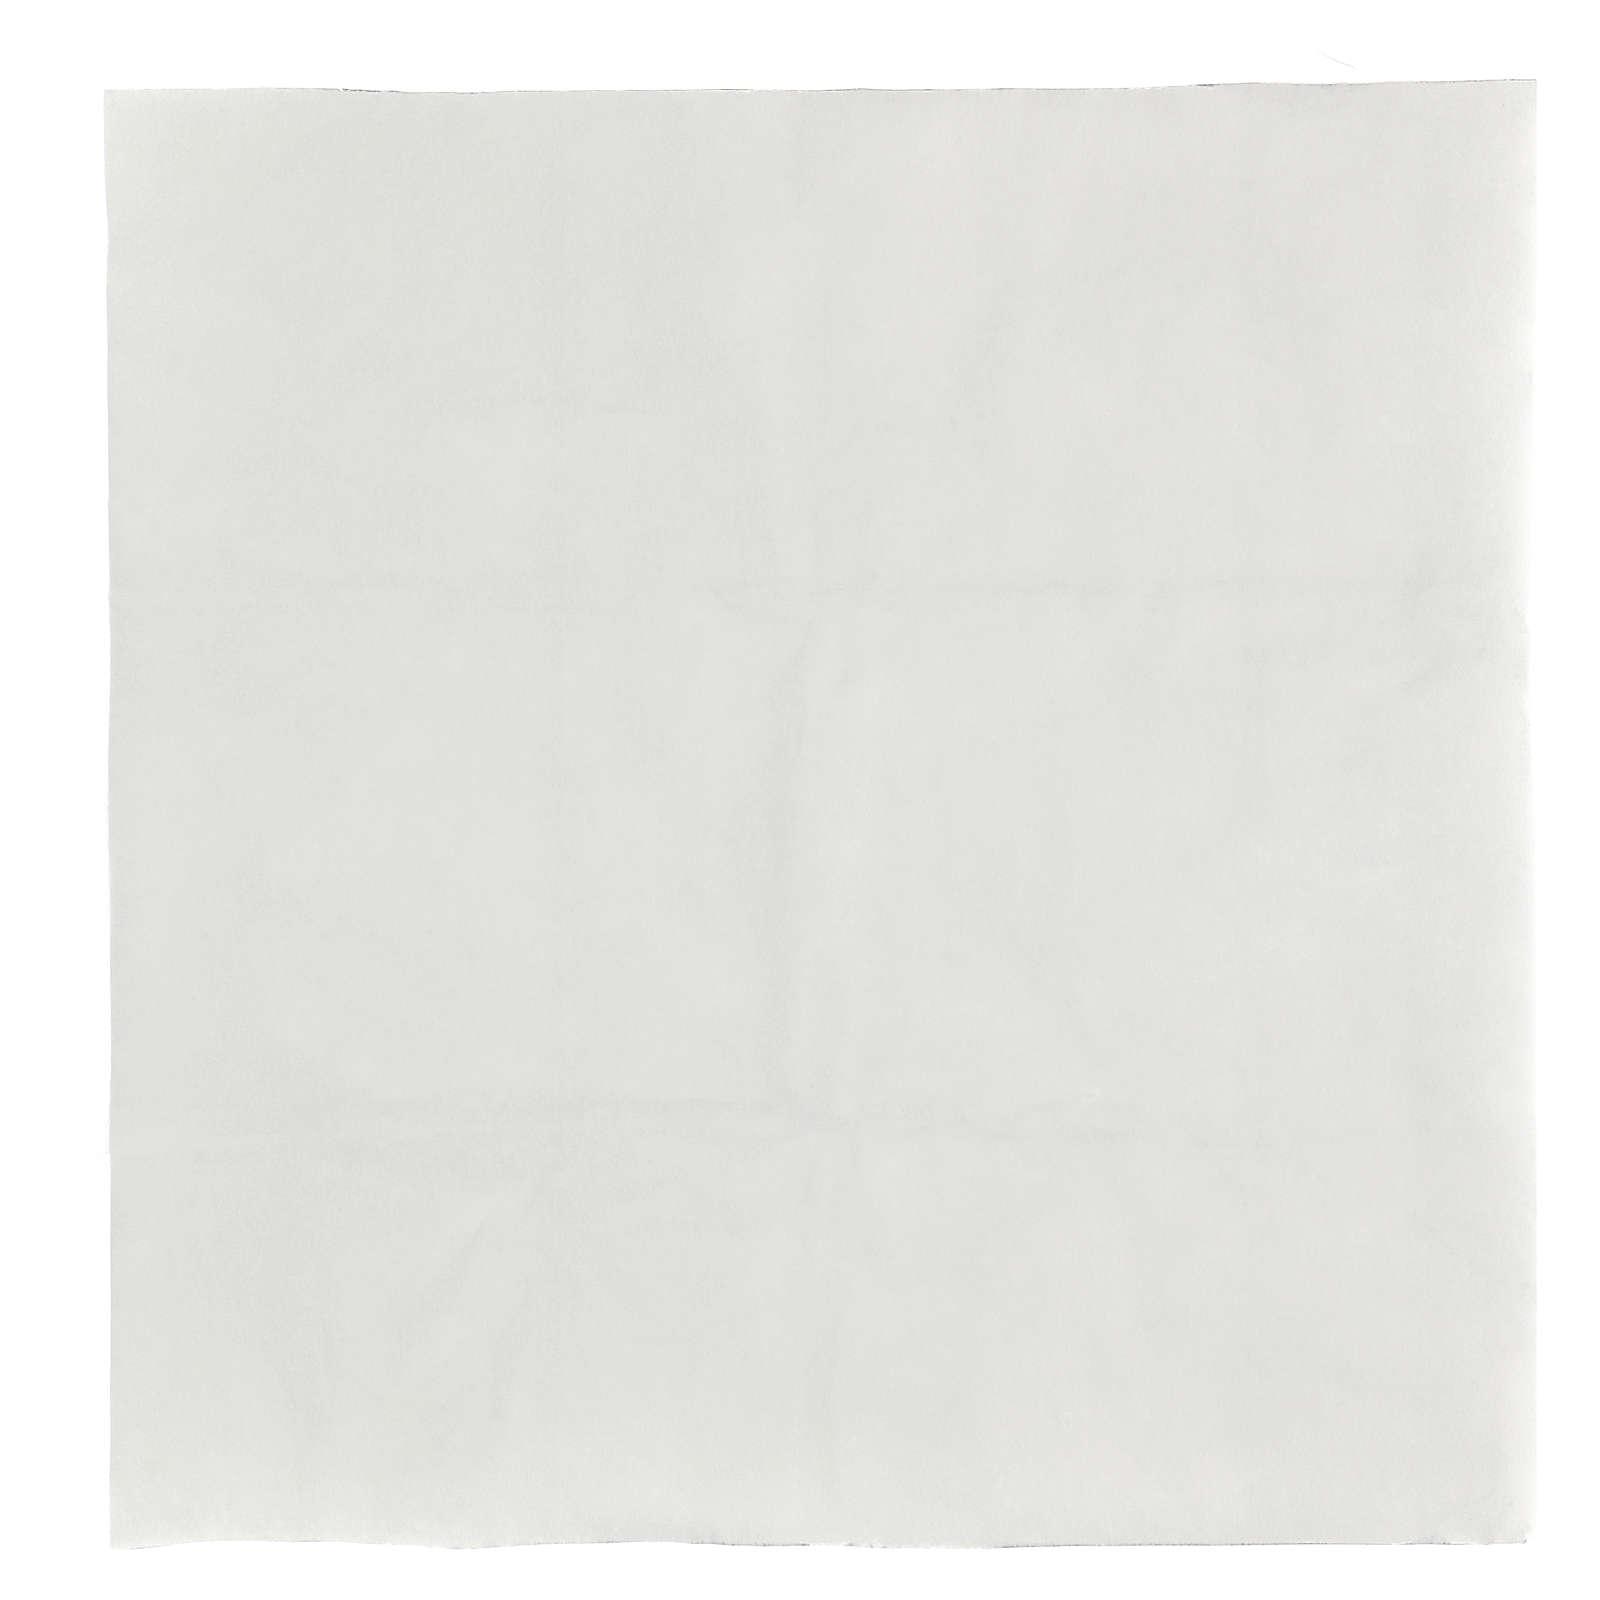 Carta ovattata neve modellabile 60x60 cm per presepi 4